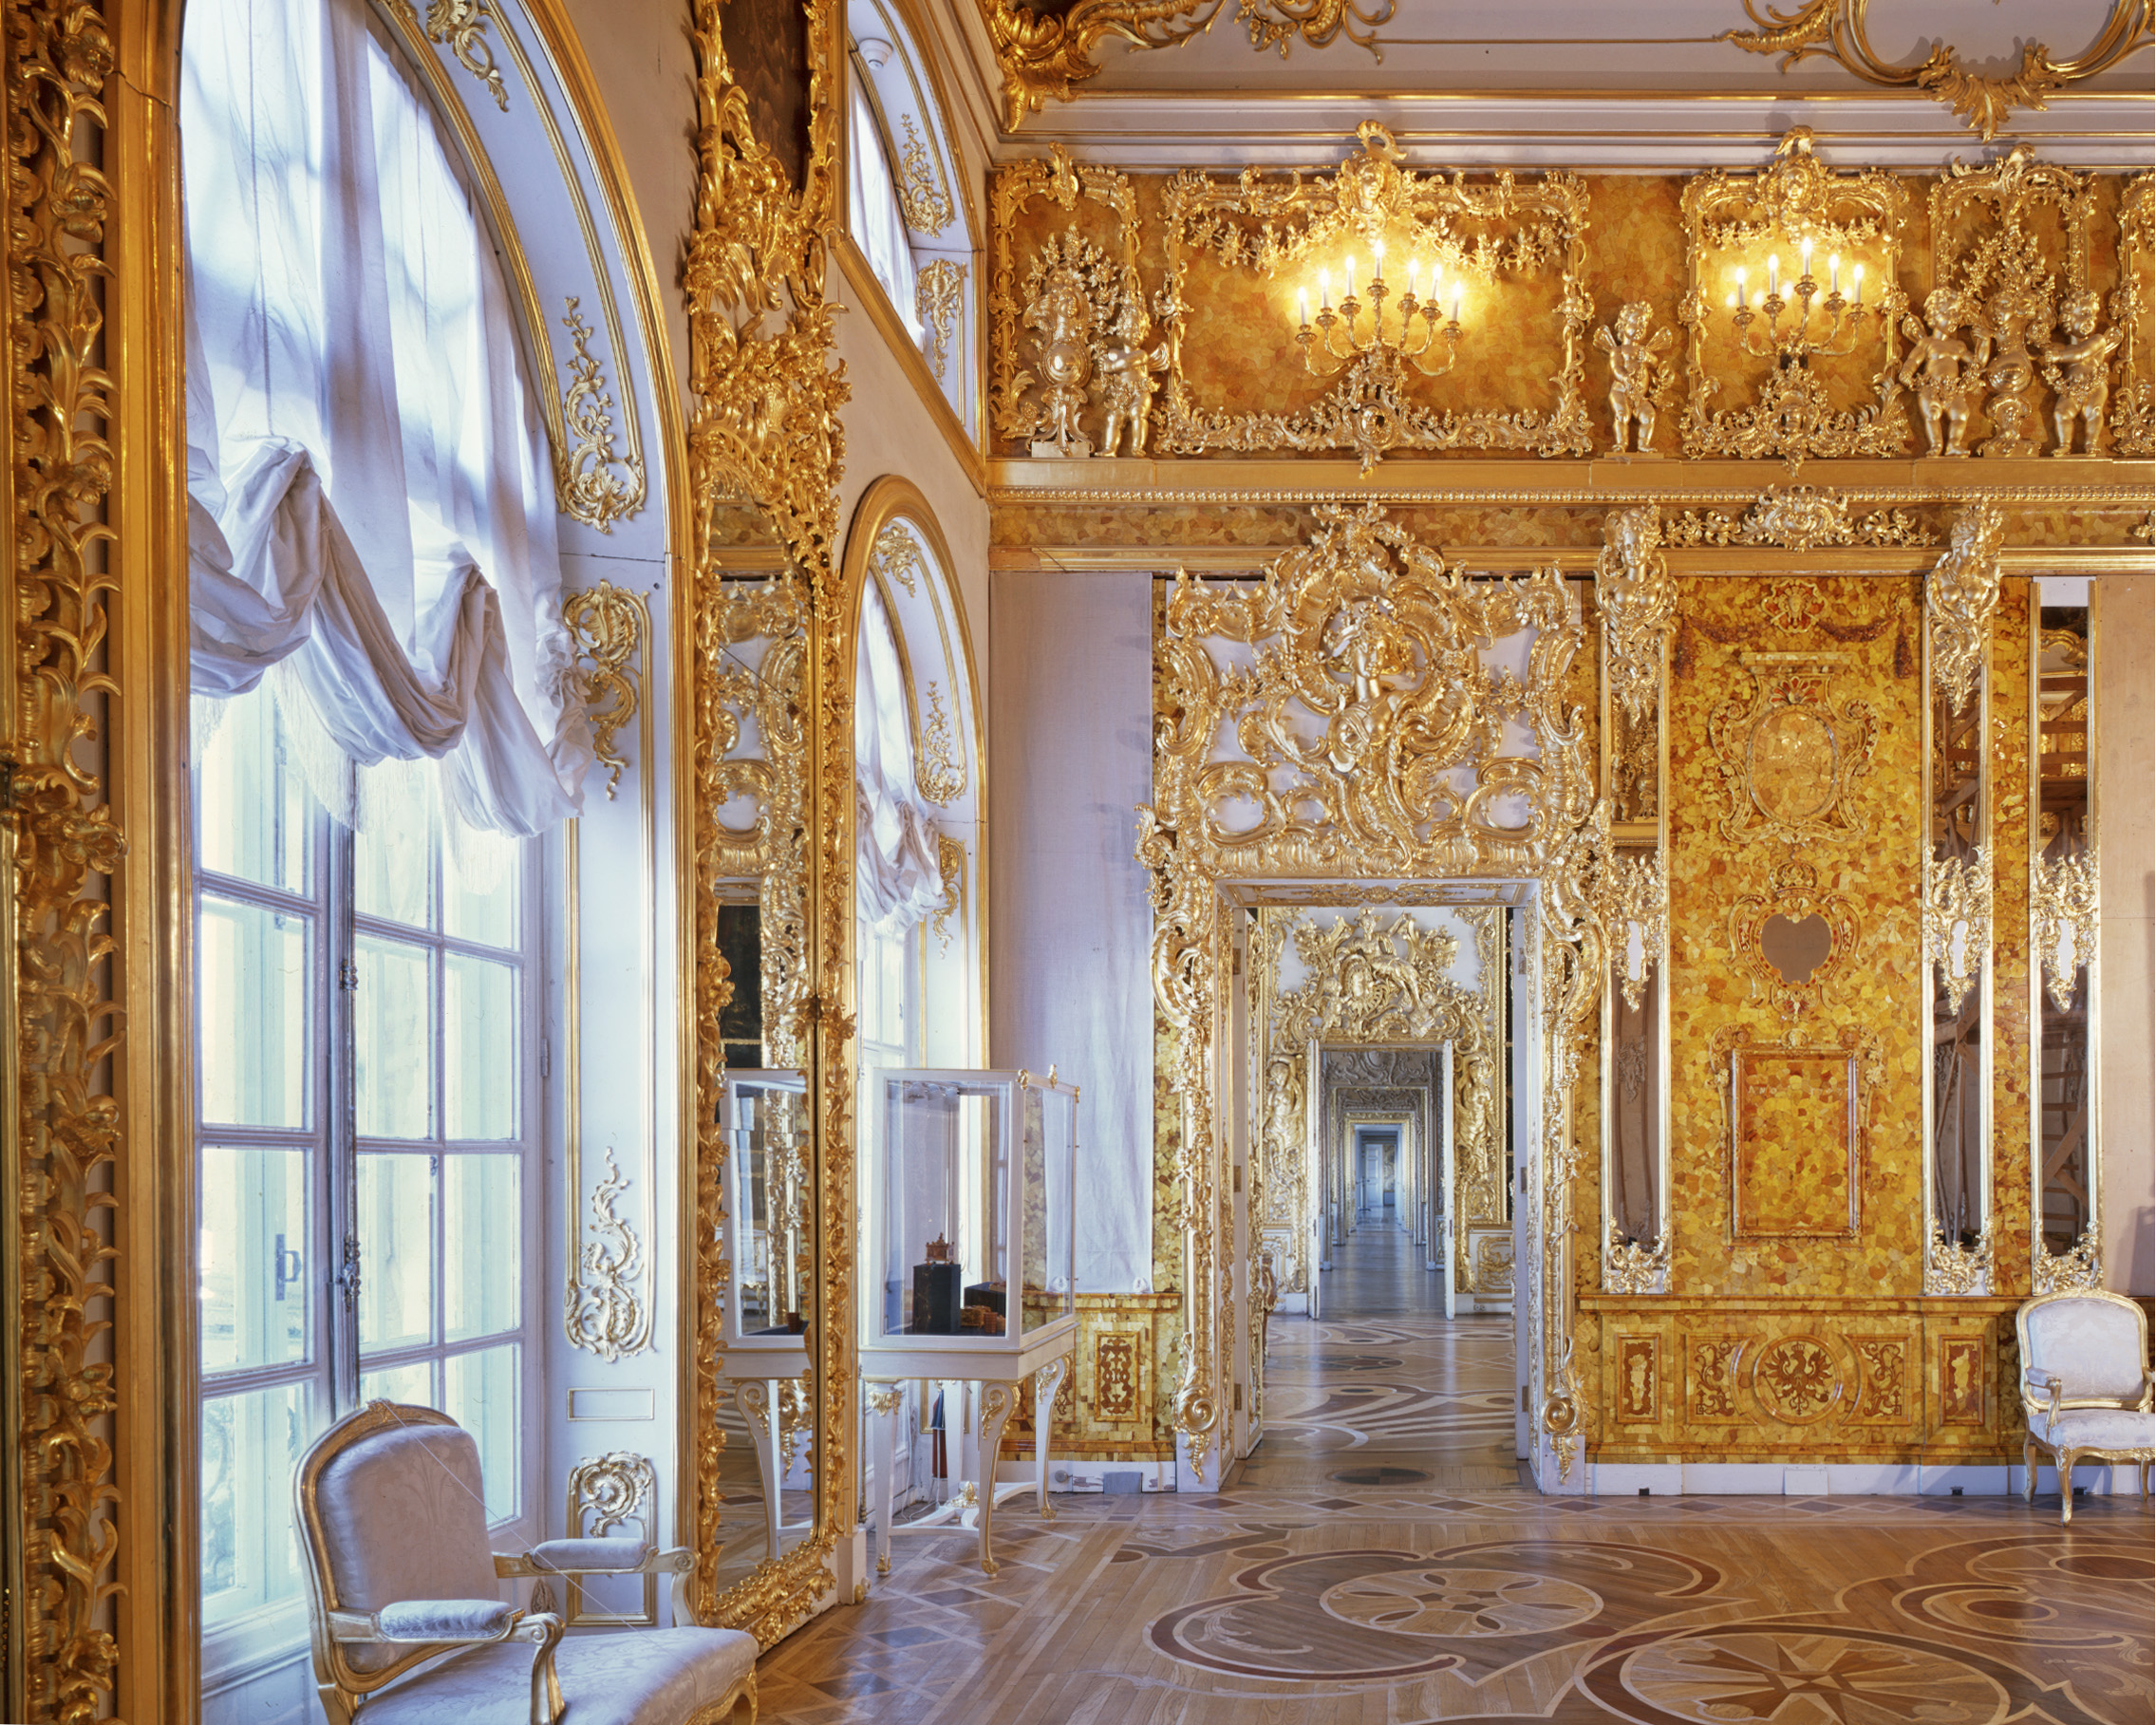 Chambre d'Ambre, Palais Catherine - Tsarskoïé Selo (Pouchkine) 2008